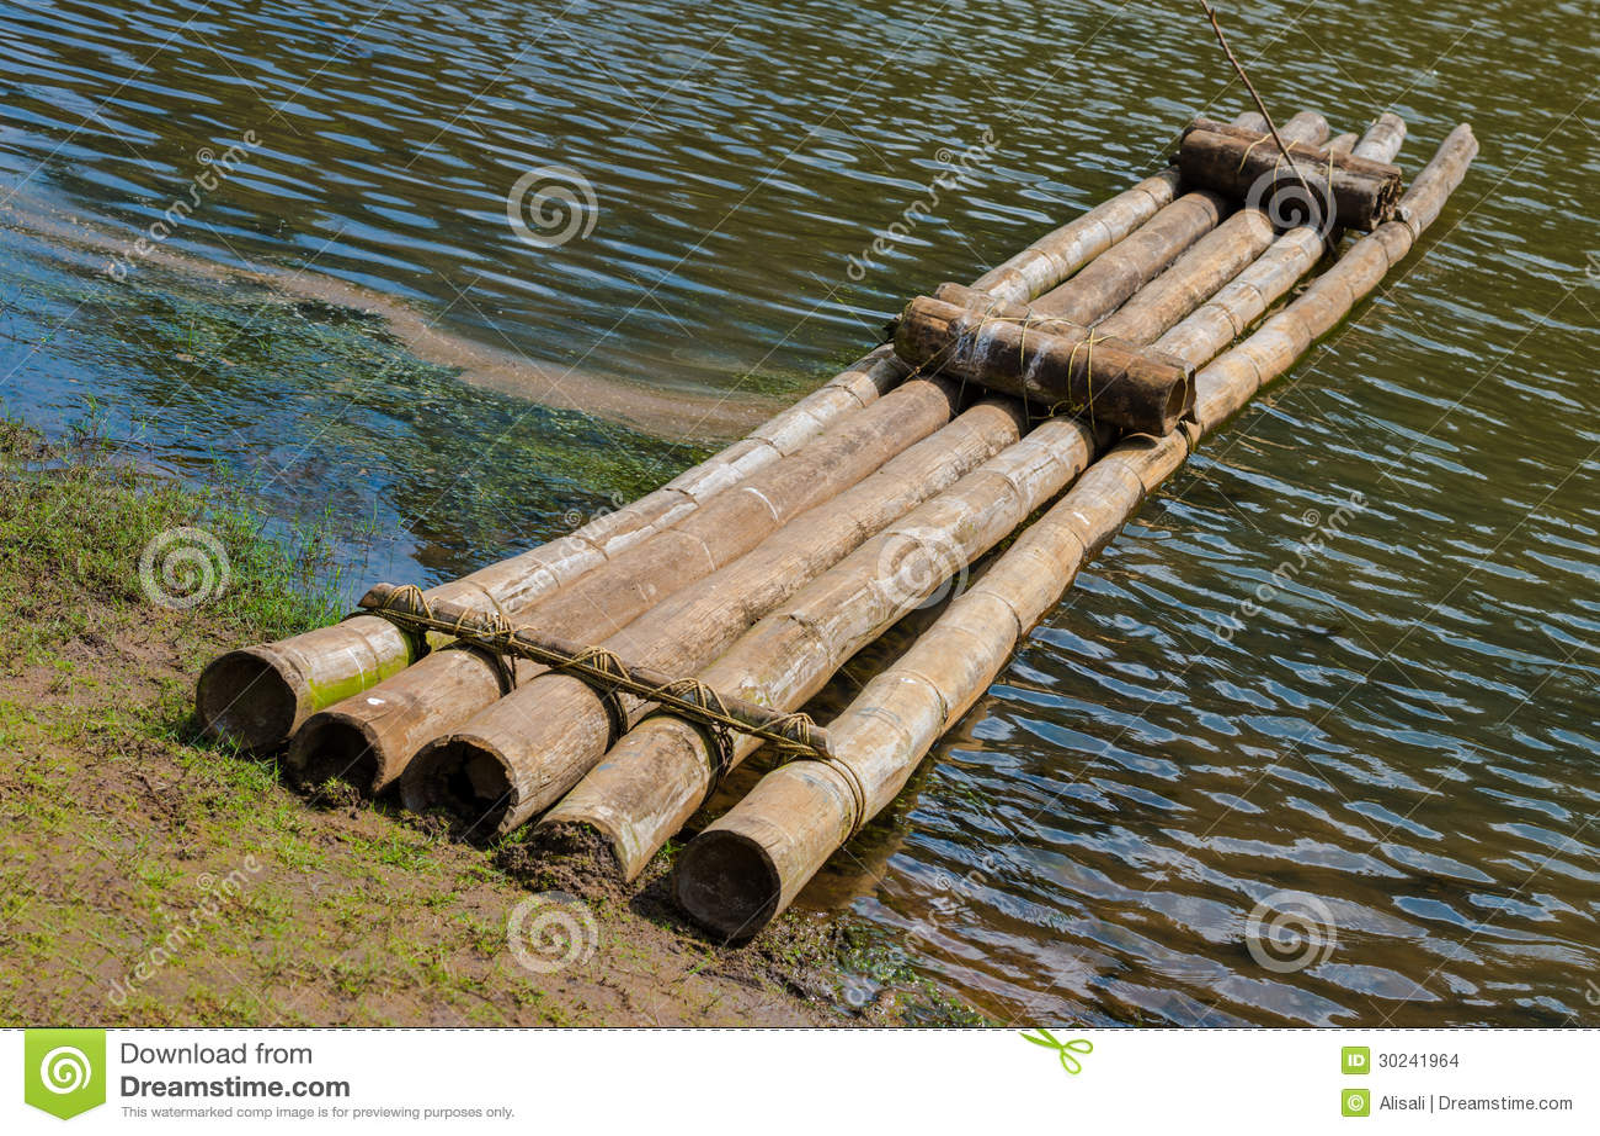 u7af9 u6728 u7b4f  u5e93 u5b58 u56fe u7247  u56fe u7247 30241964 bamboo vectical hardwood bamboo vector free download